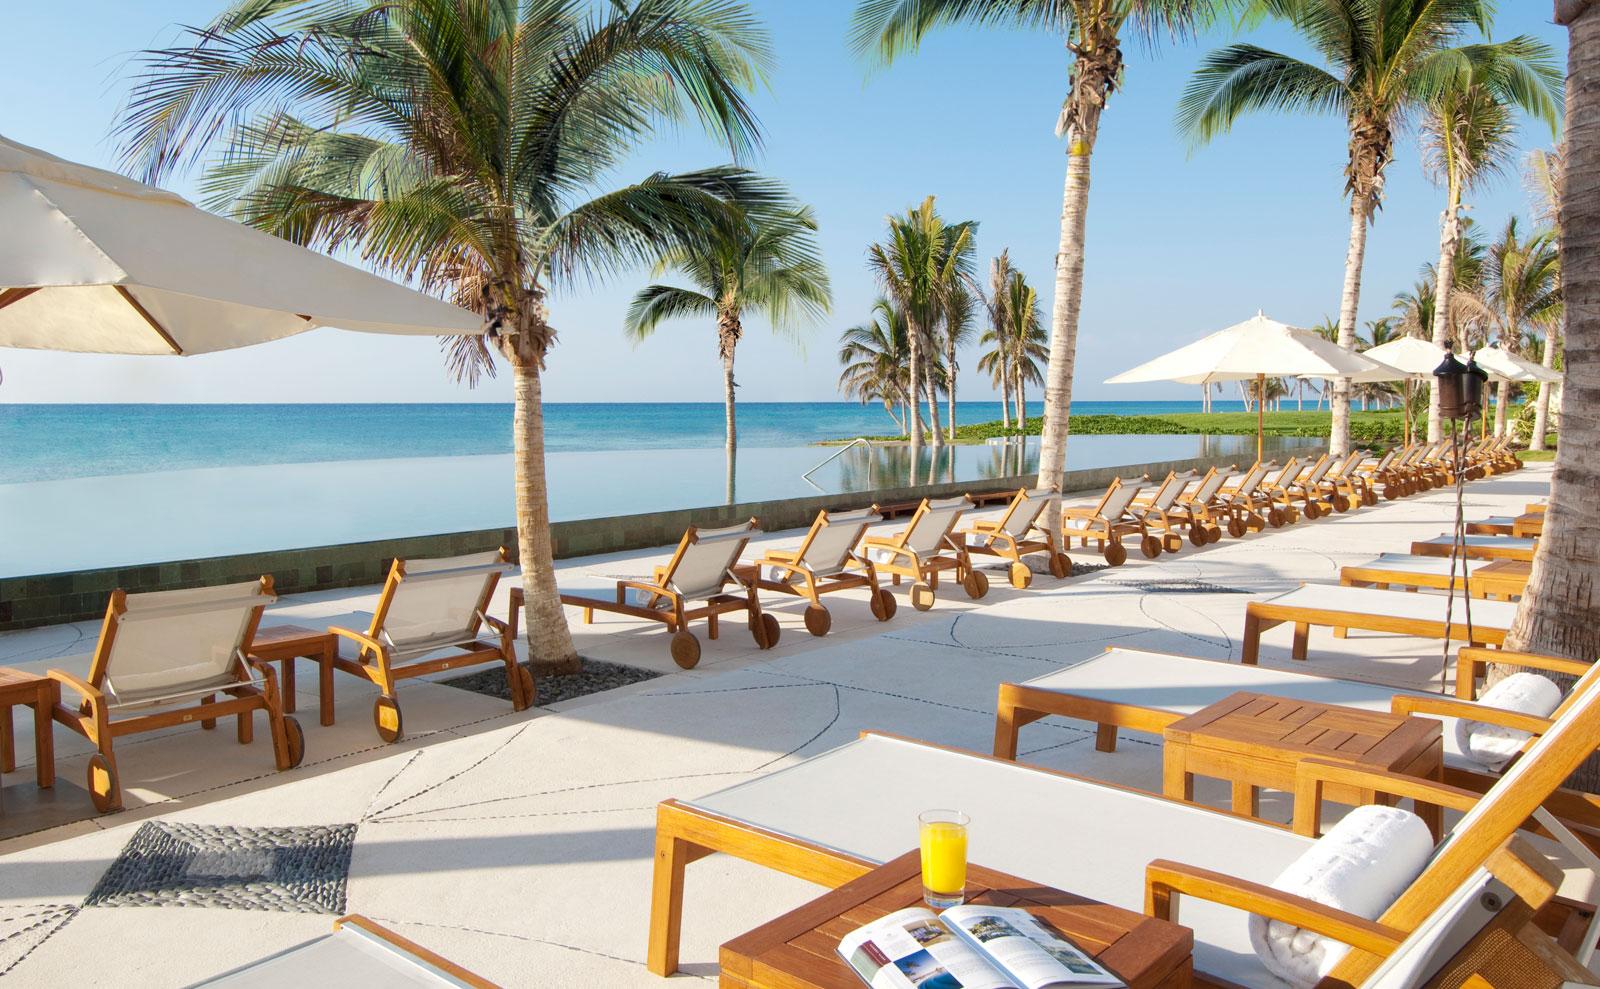 Hotel Grand Velas Riviera Maya Mexico